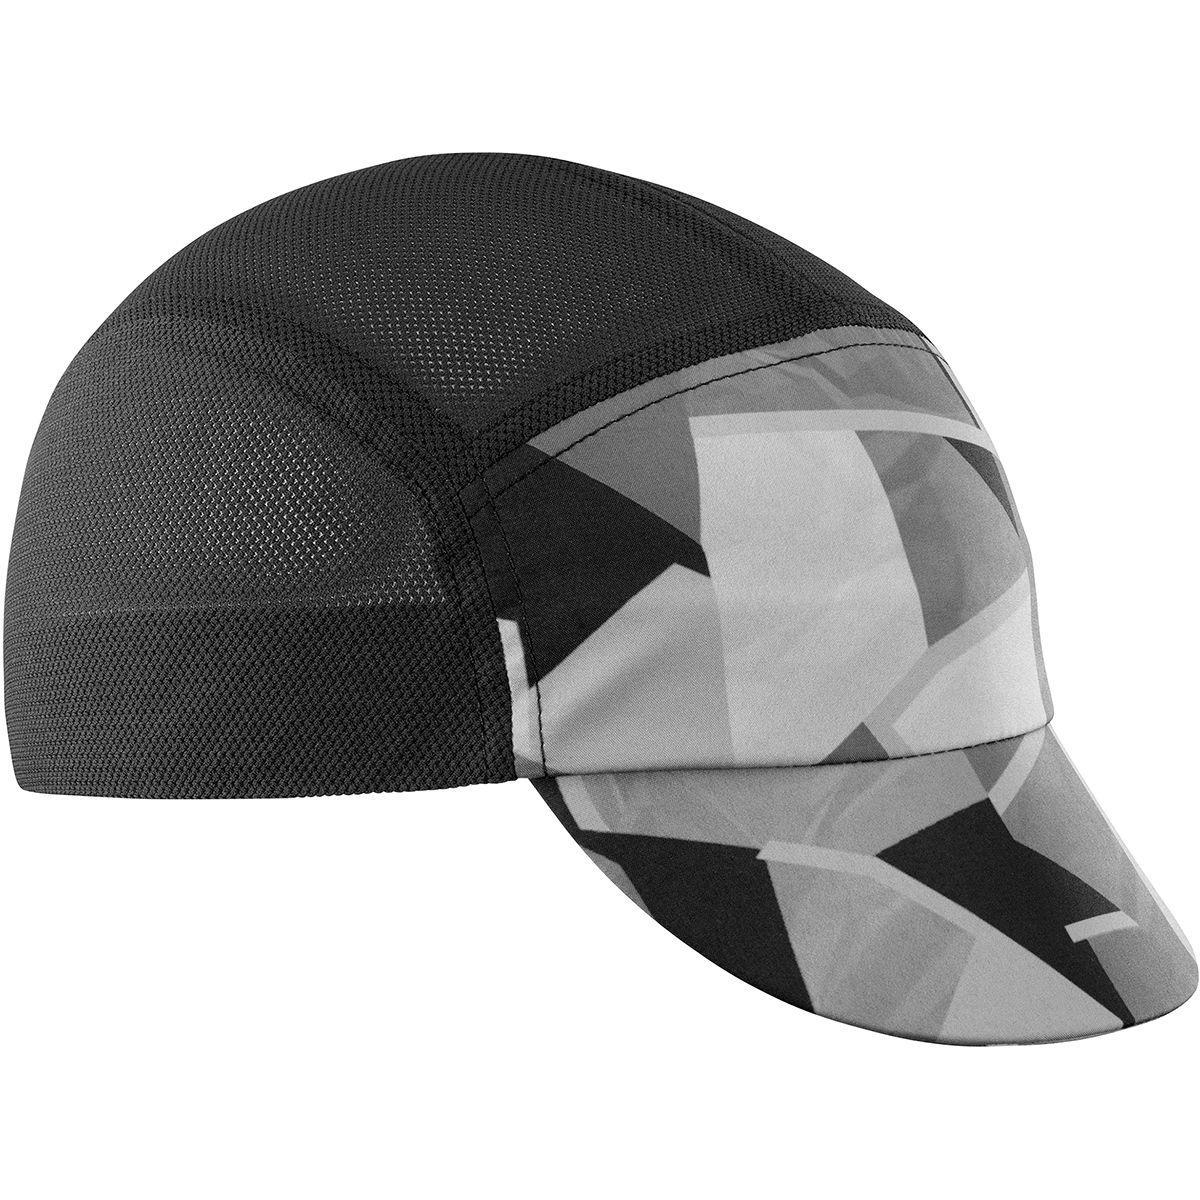 Lyst - Yves Salomon Air Logo Cap in Black for Men 8976a98fc3eb